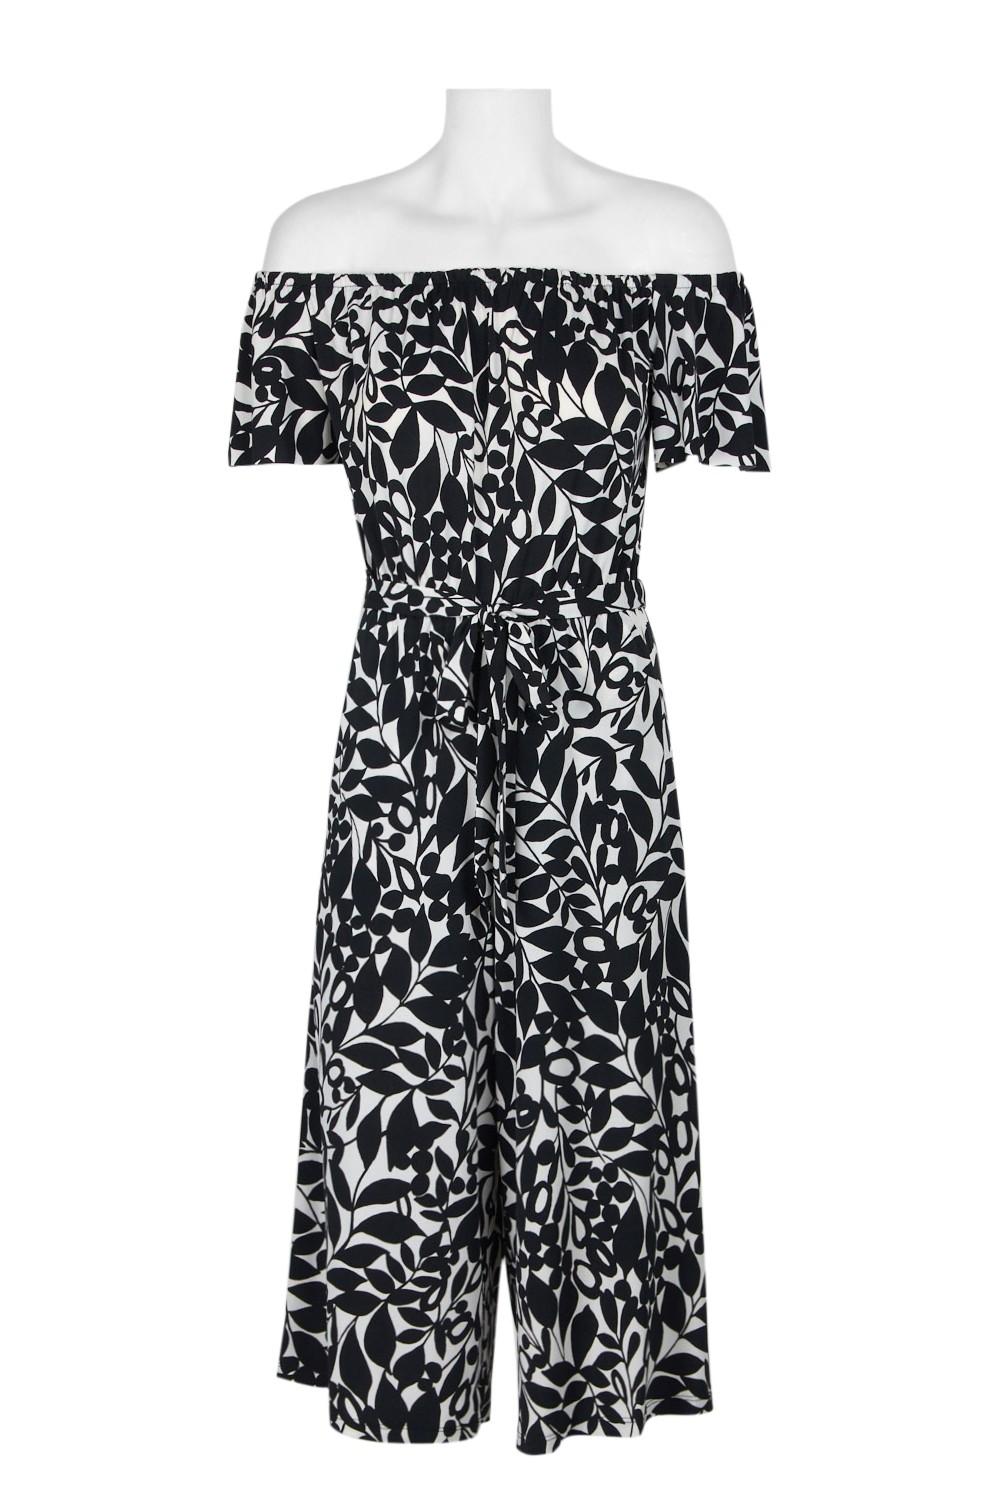 5593e57a9f9c London Times Off-Shoulder SHort Sleeve Tie Waist Multi Print Jersey ...